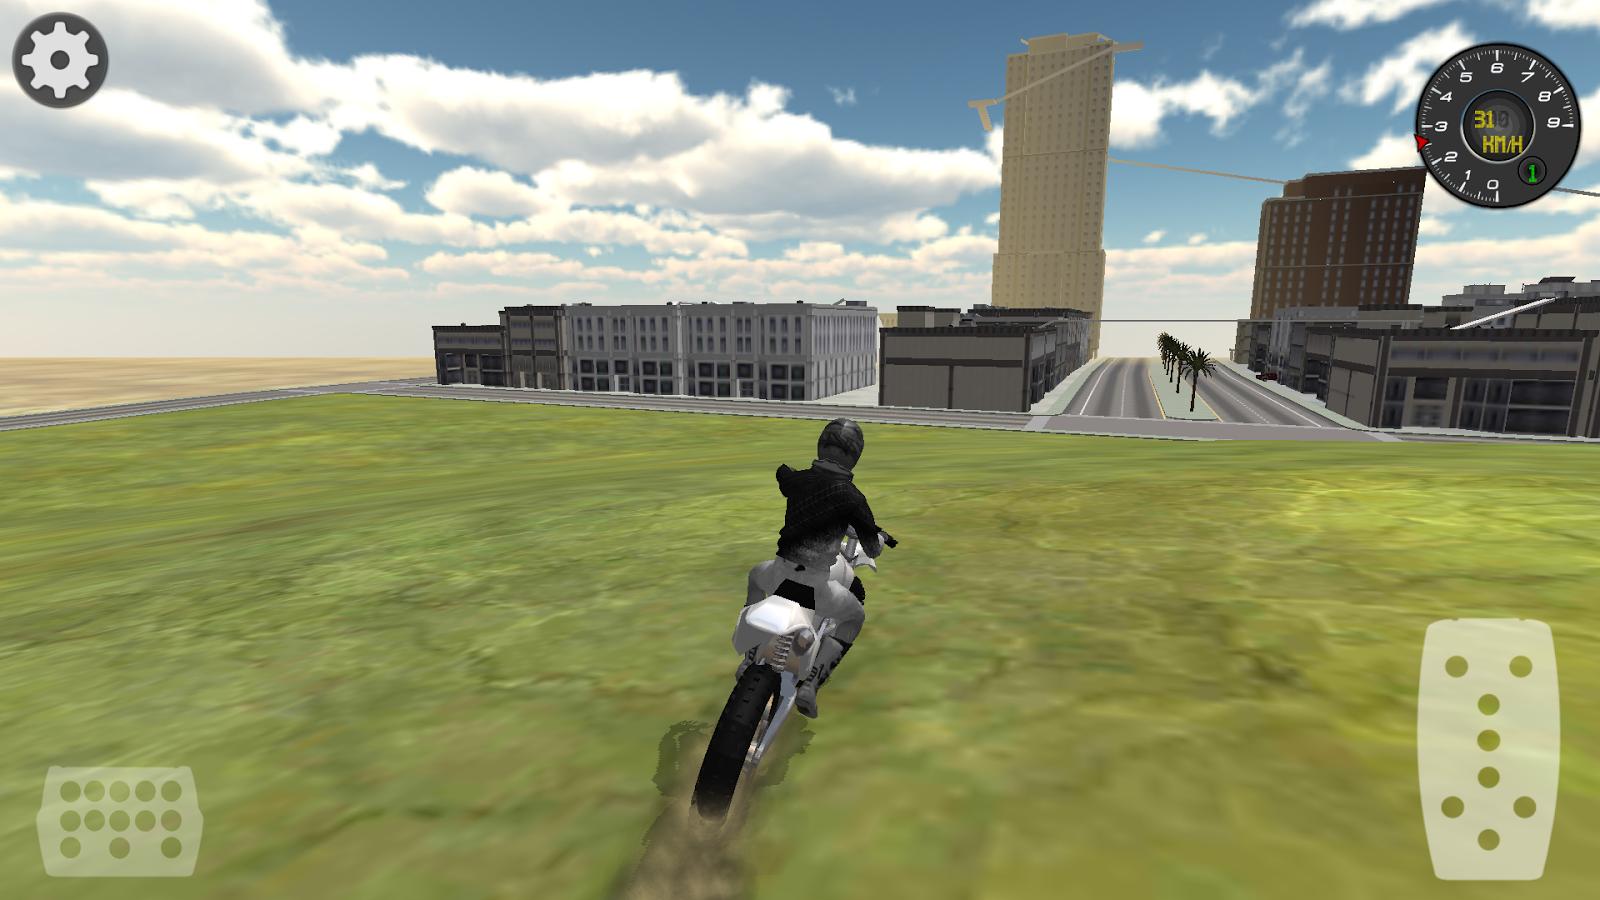 motorrad spiele kostenlos downloaden